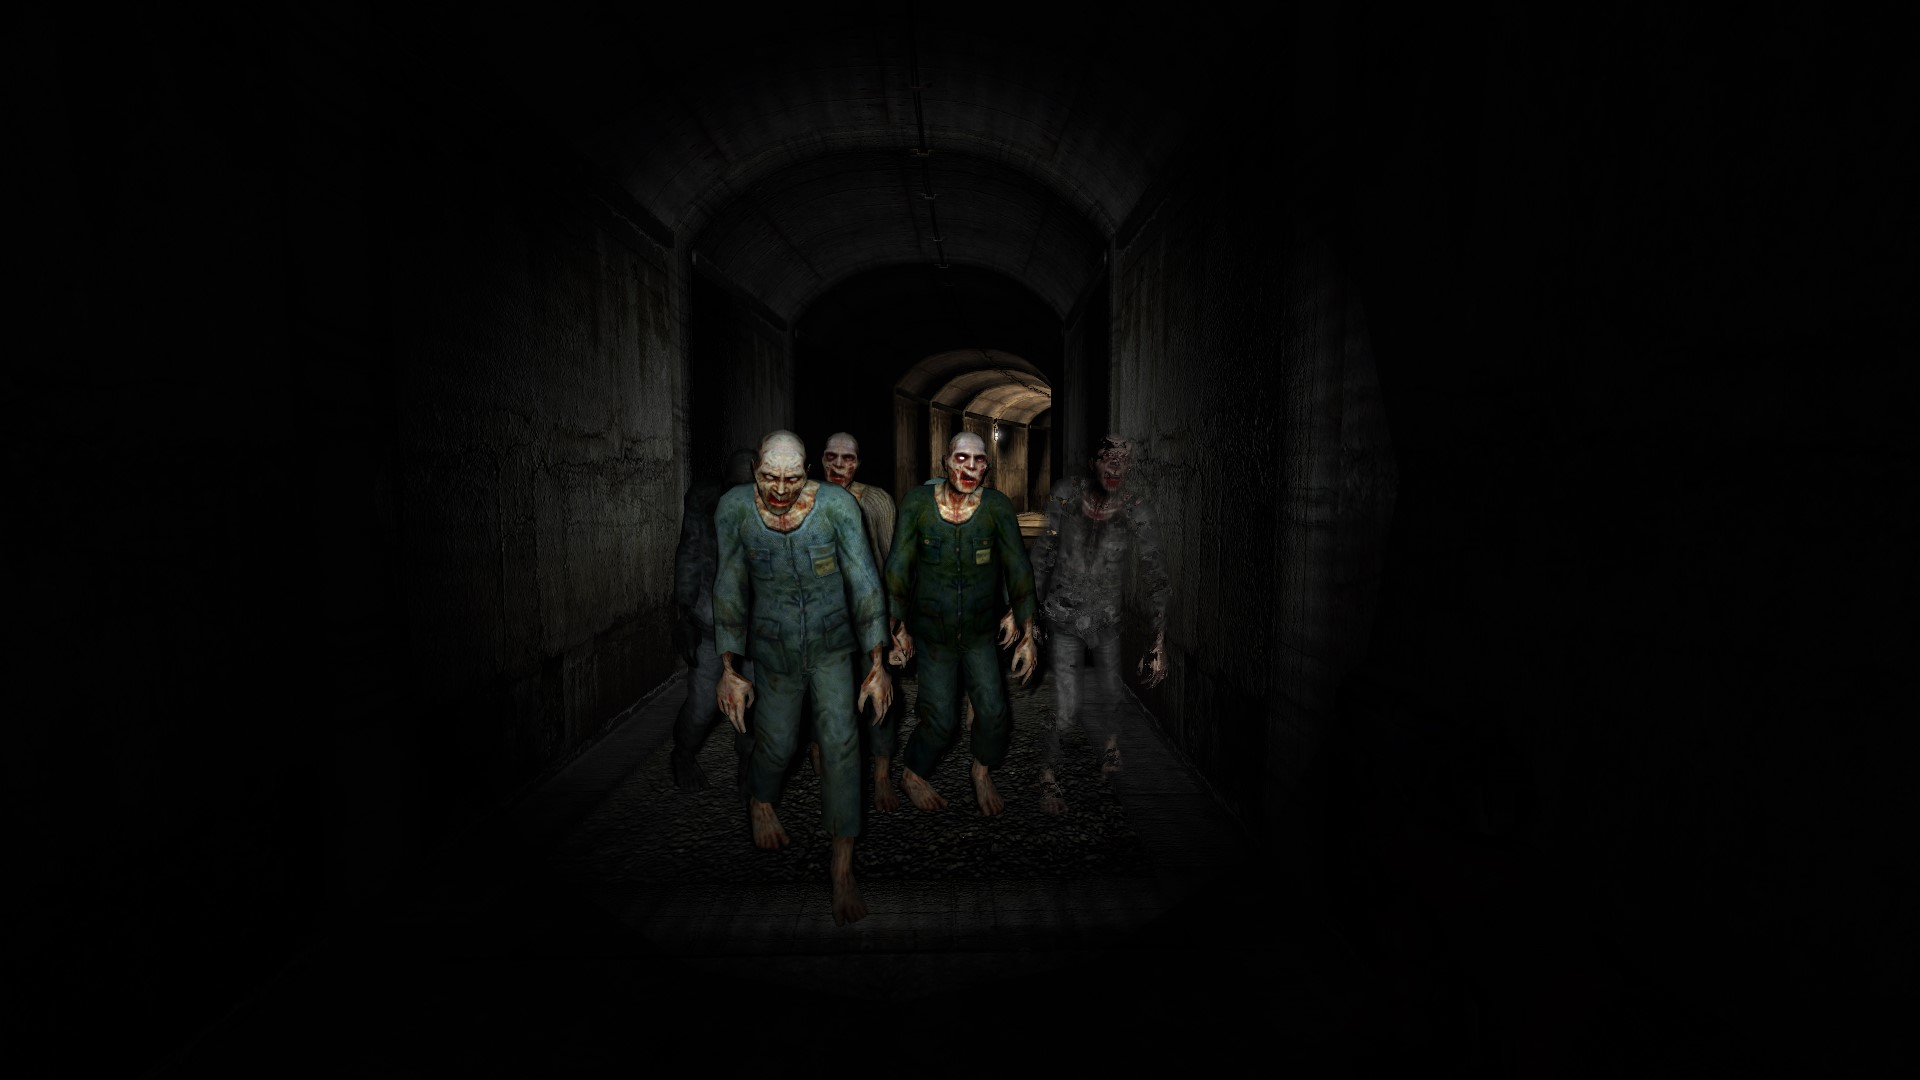 Burer. Stalker and the story of the sinister dwarf